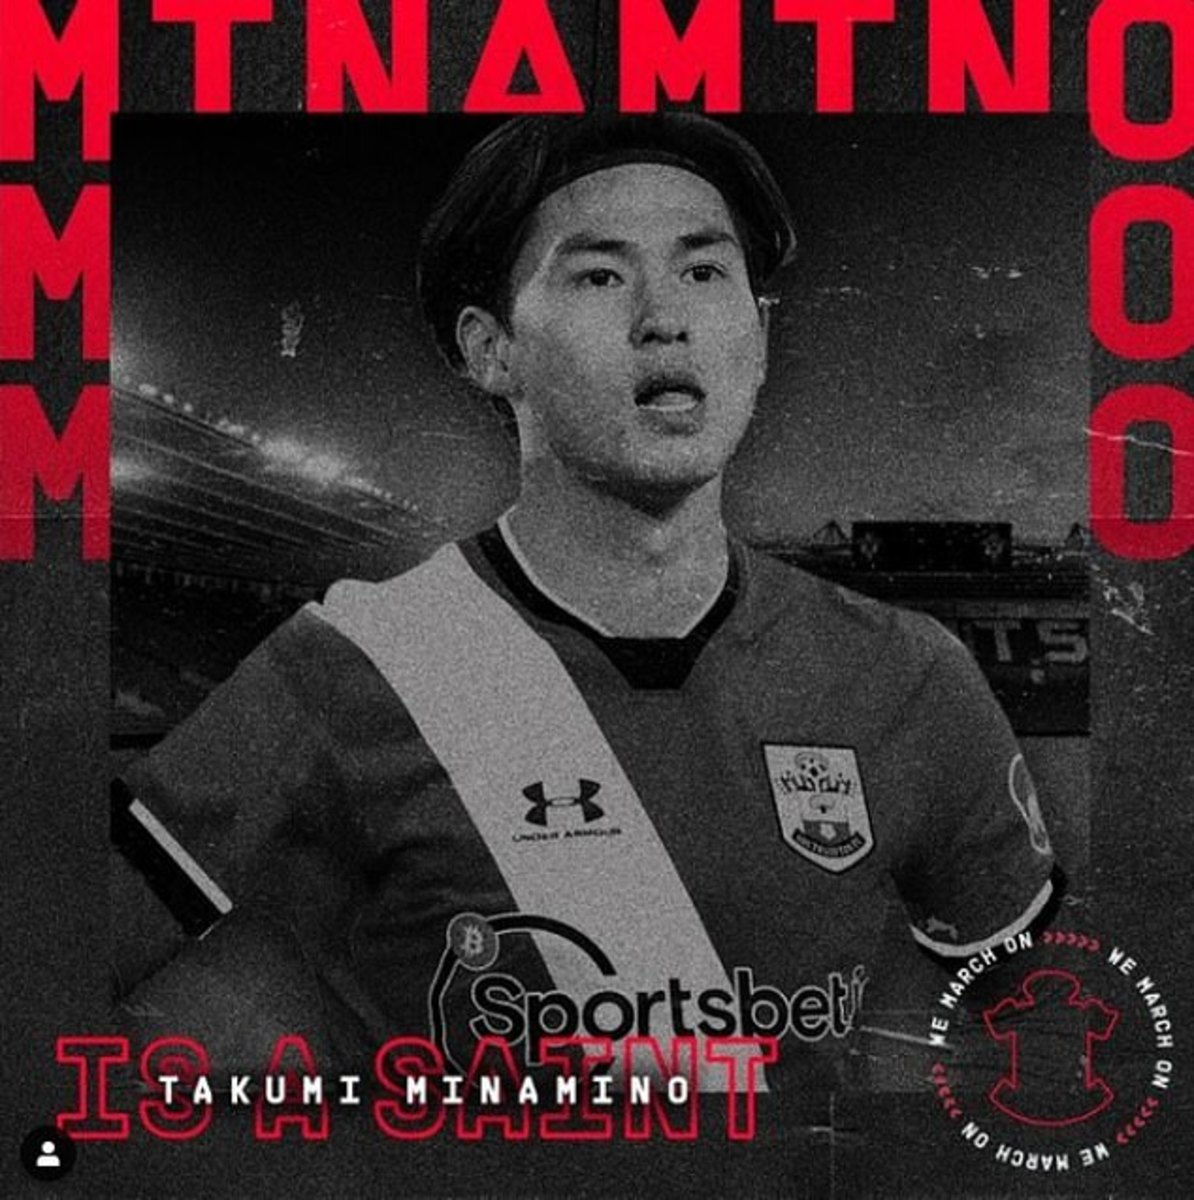 Southampton FC's Takumi Minamino loan announcement